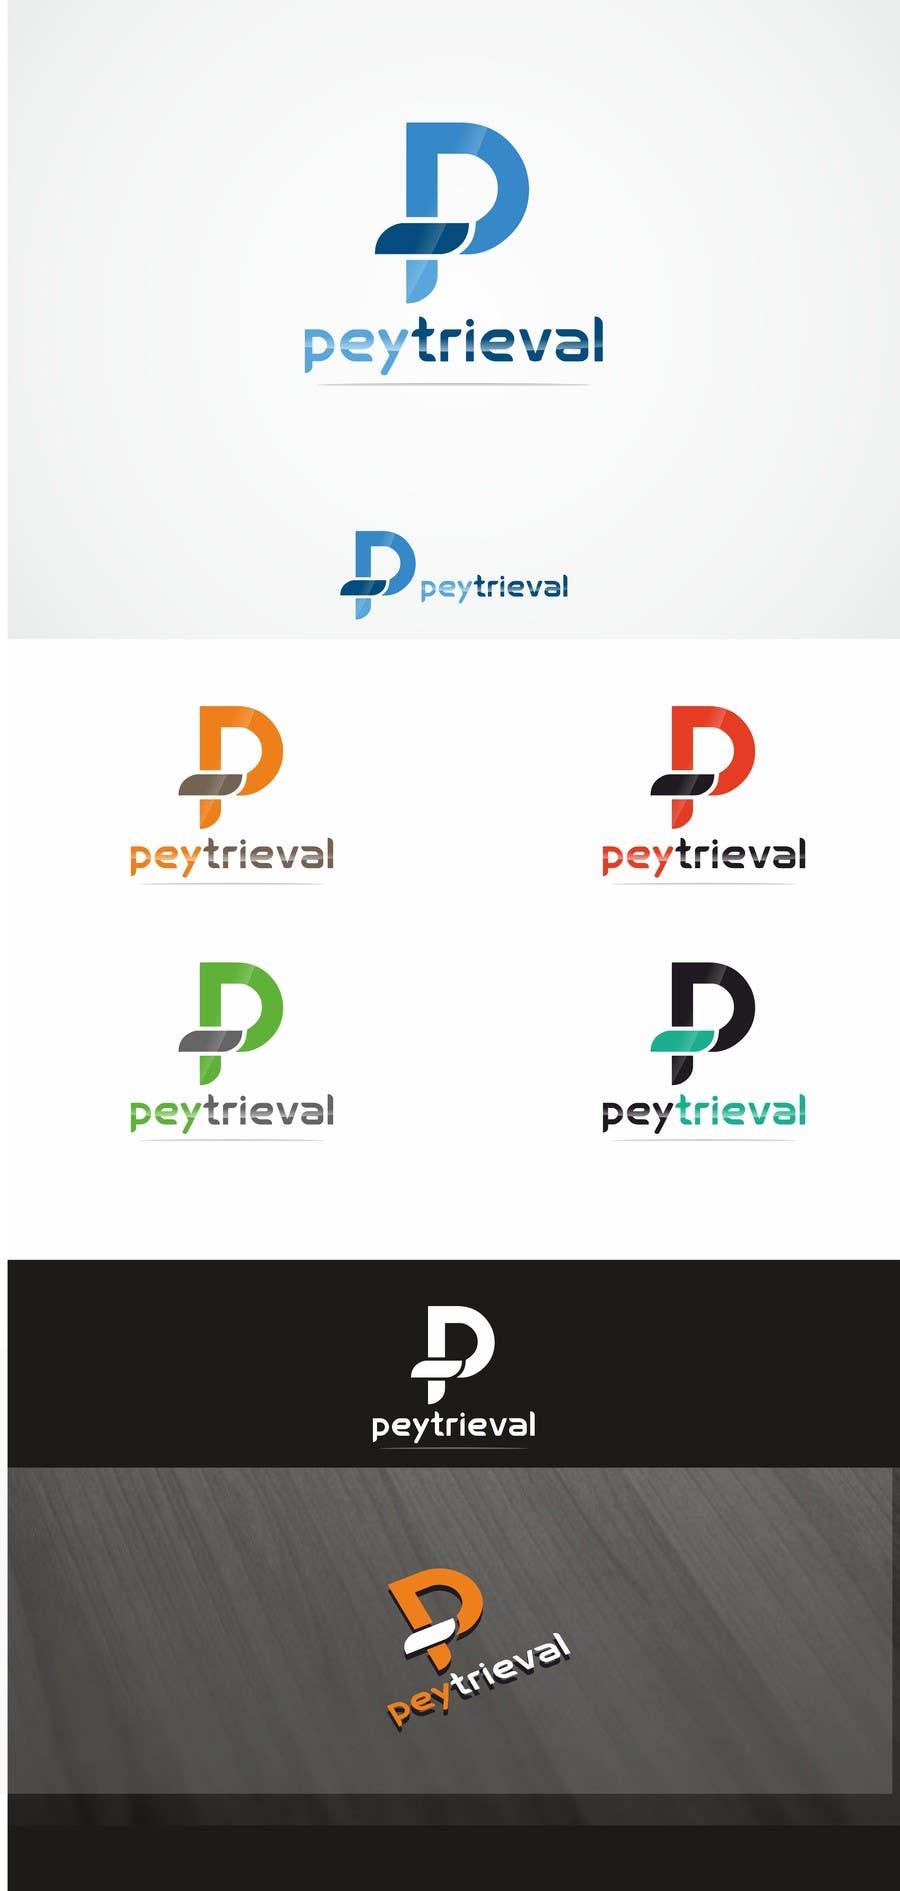 Bài tham dự cuộc thi #                                        136                                      cho                                         Design a Logo for Paytrieval (Timesheet entering and Payslip checking app)